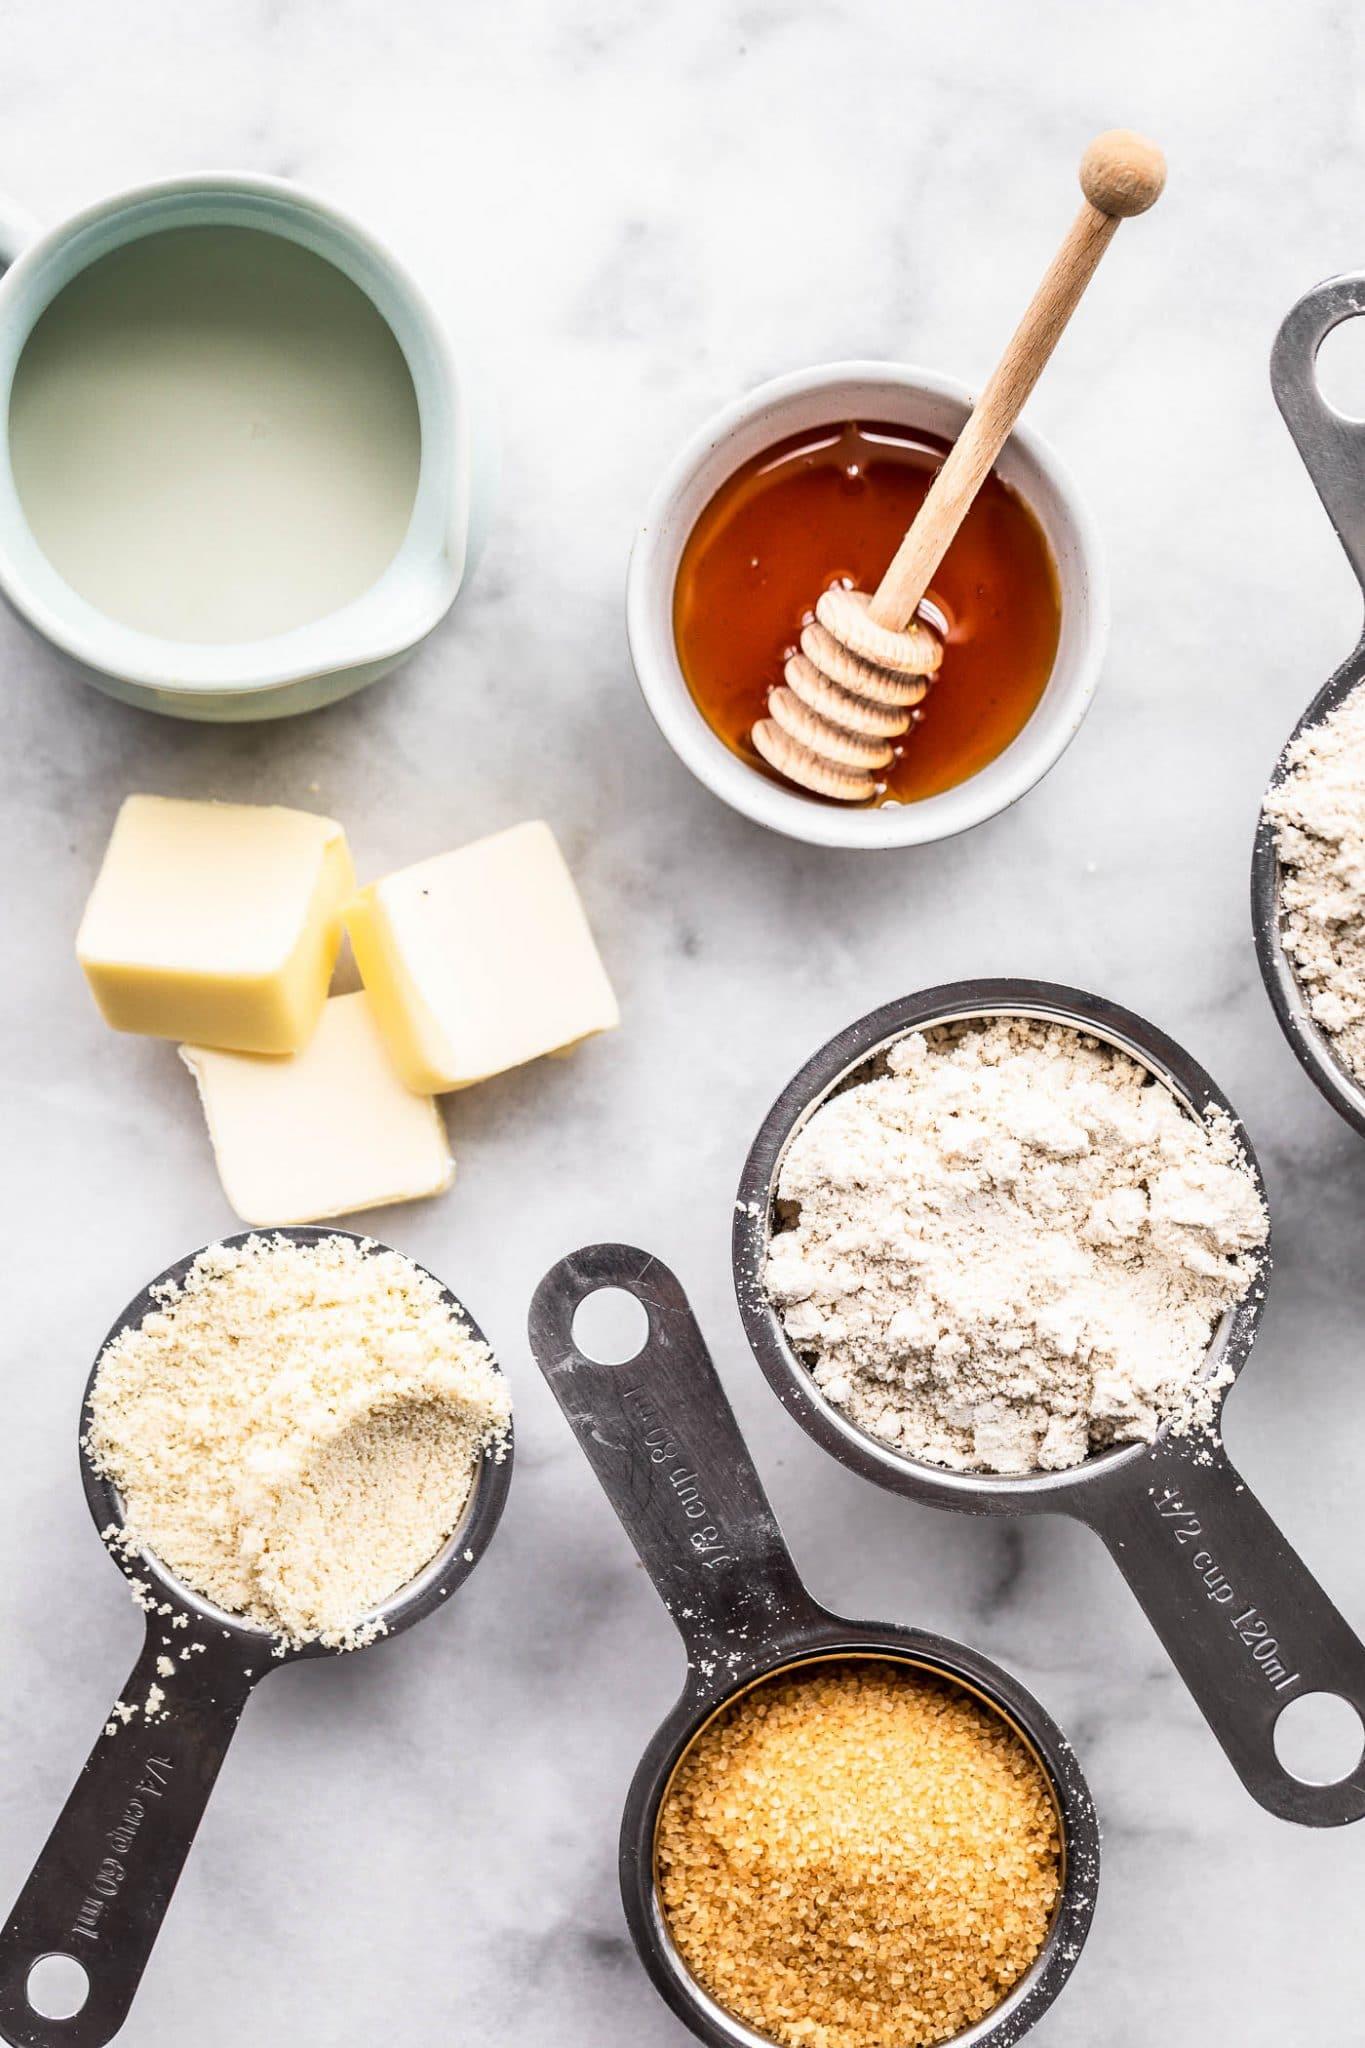 Overhead image of ingredients needed for gluten-free graham crackers.